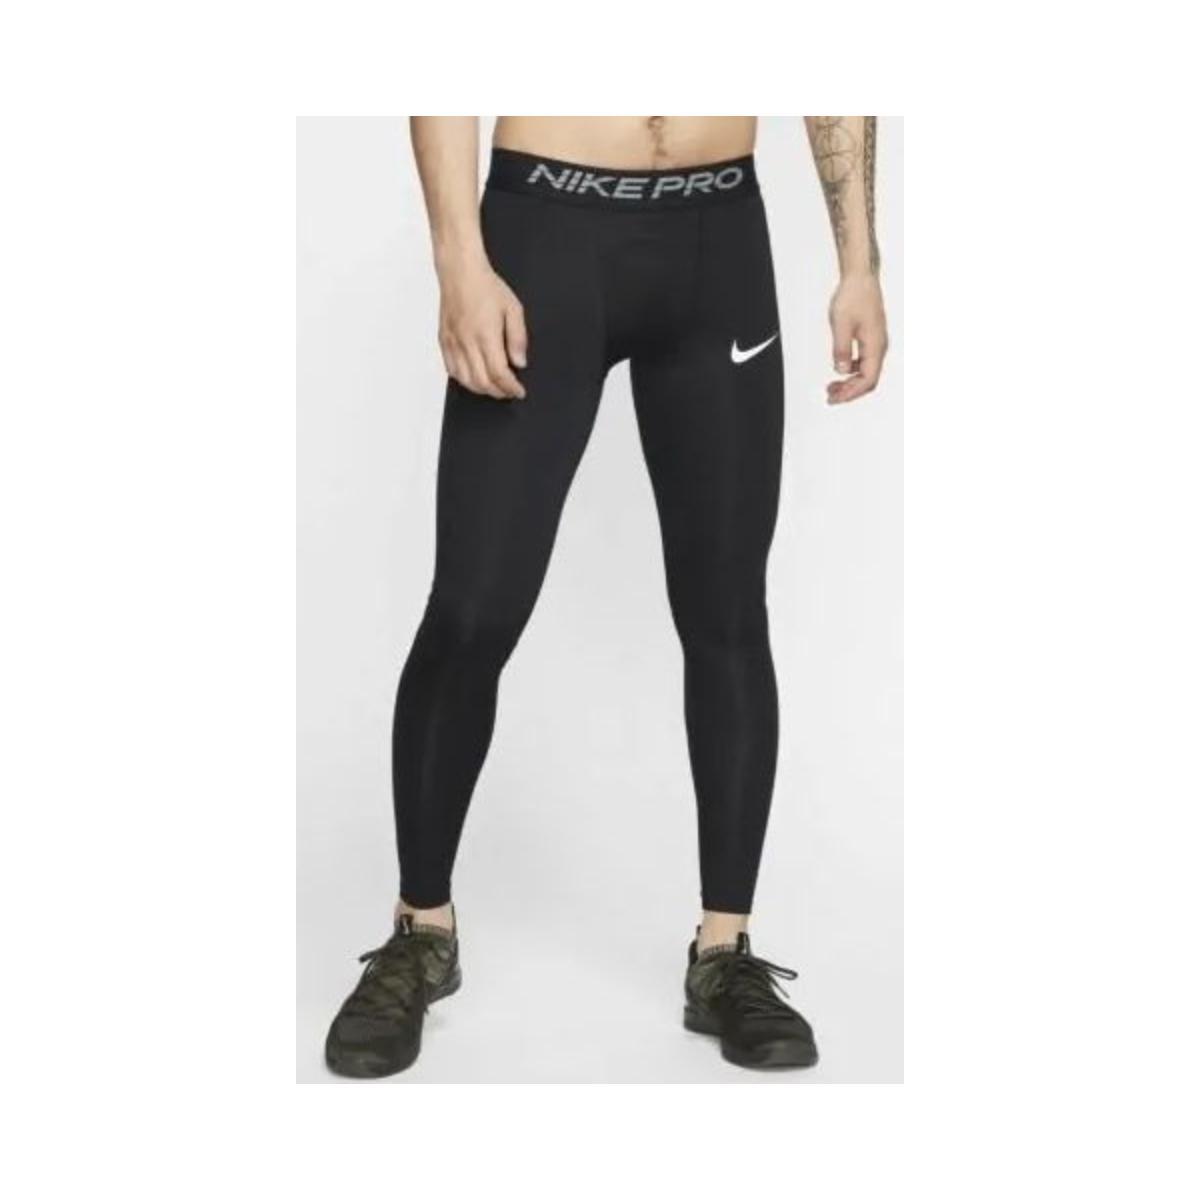 Calça Masculina Nike Bv5641-010 Pro Preto/branco